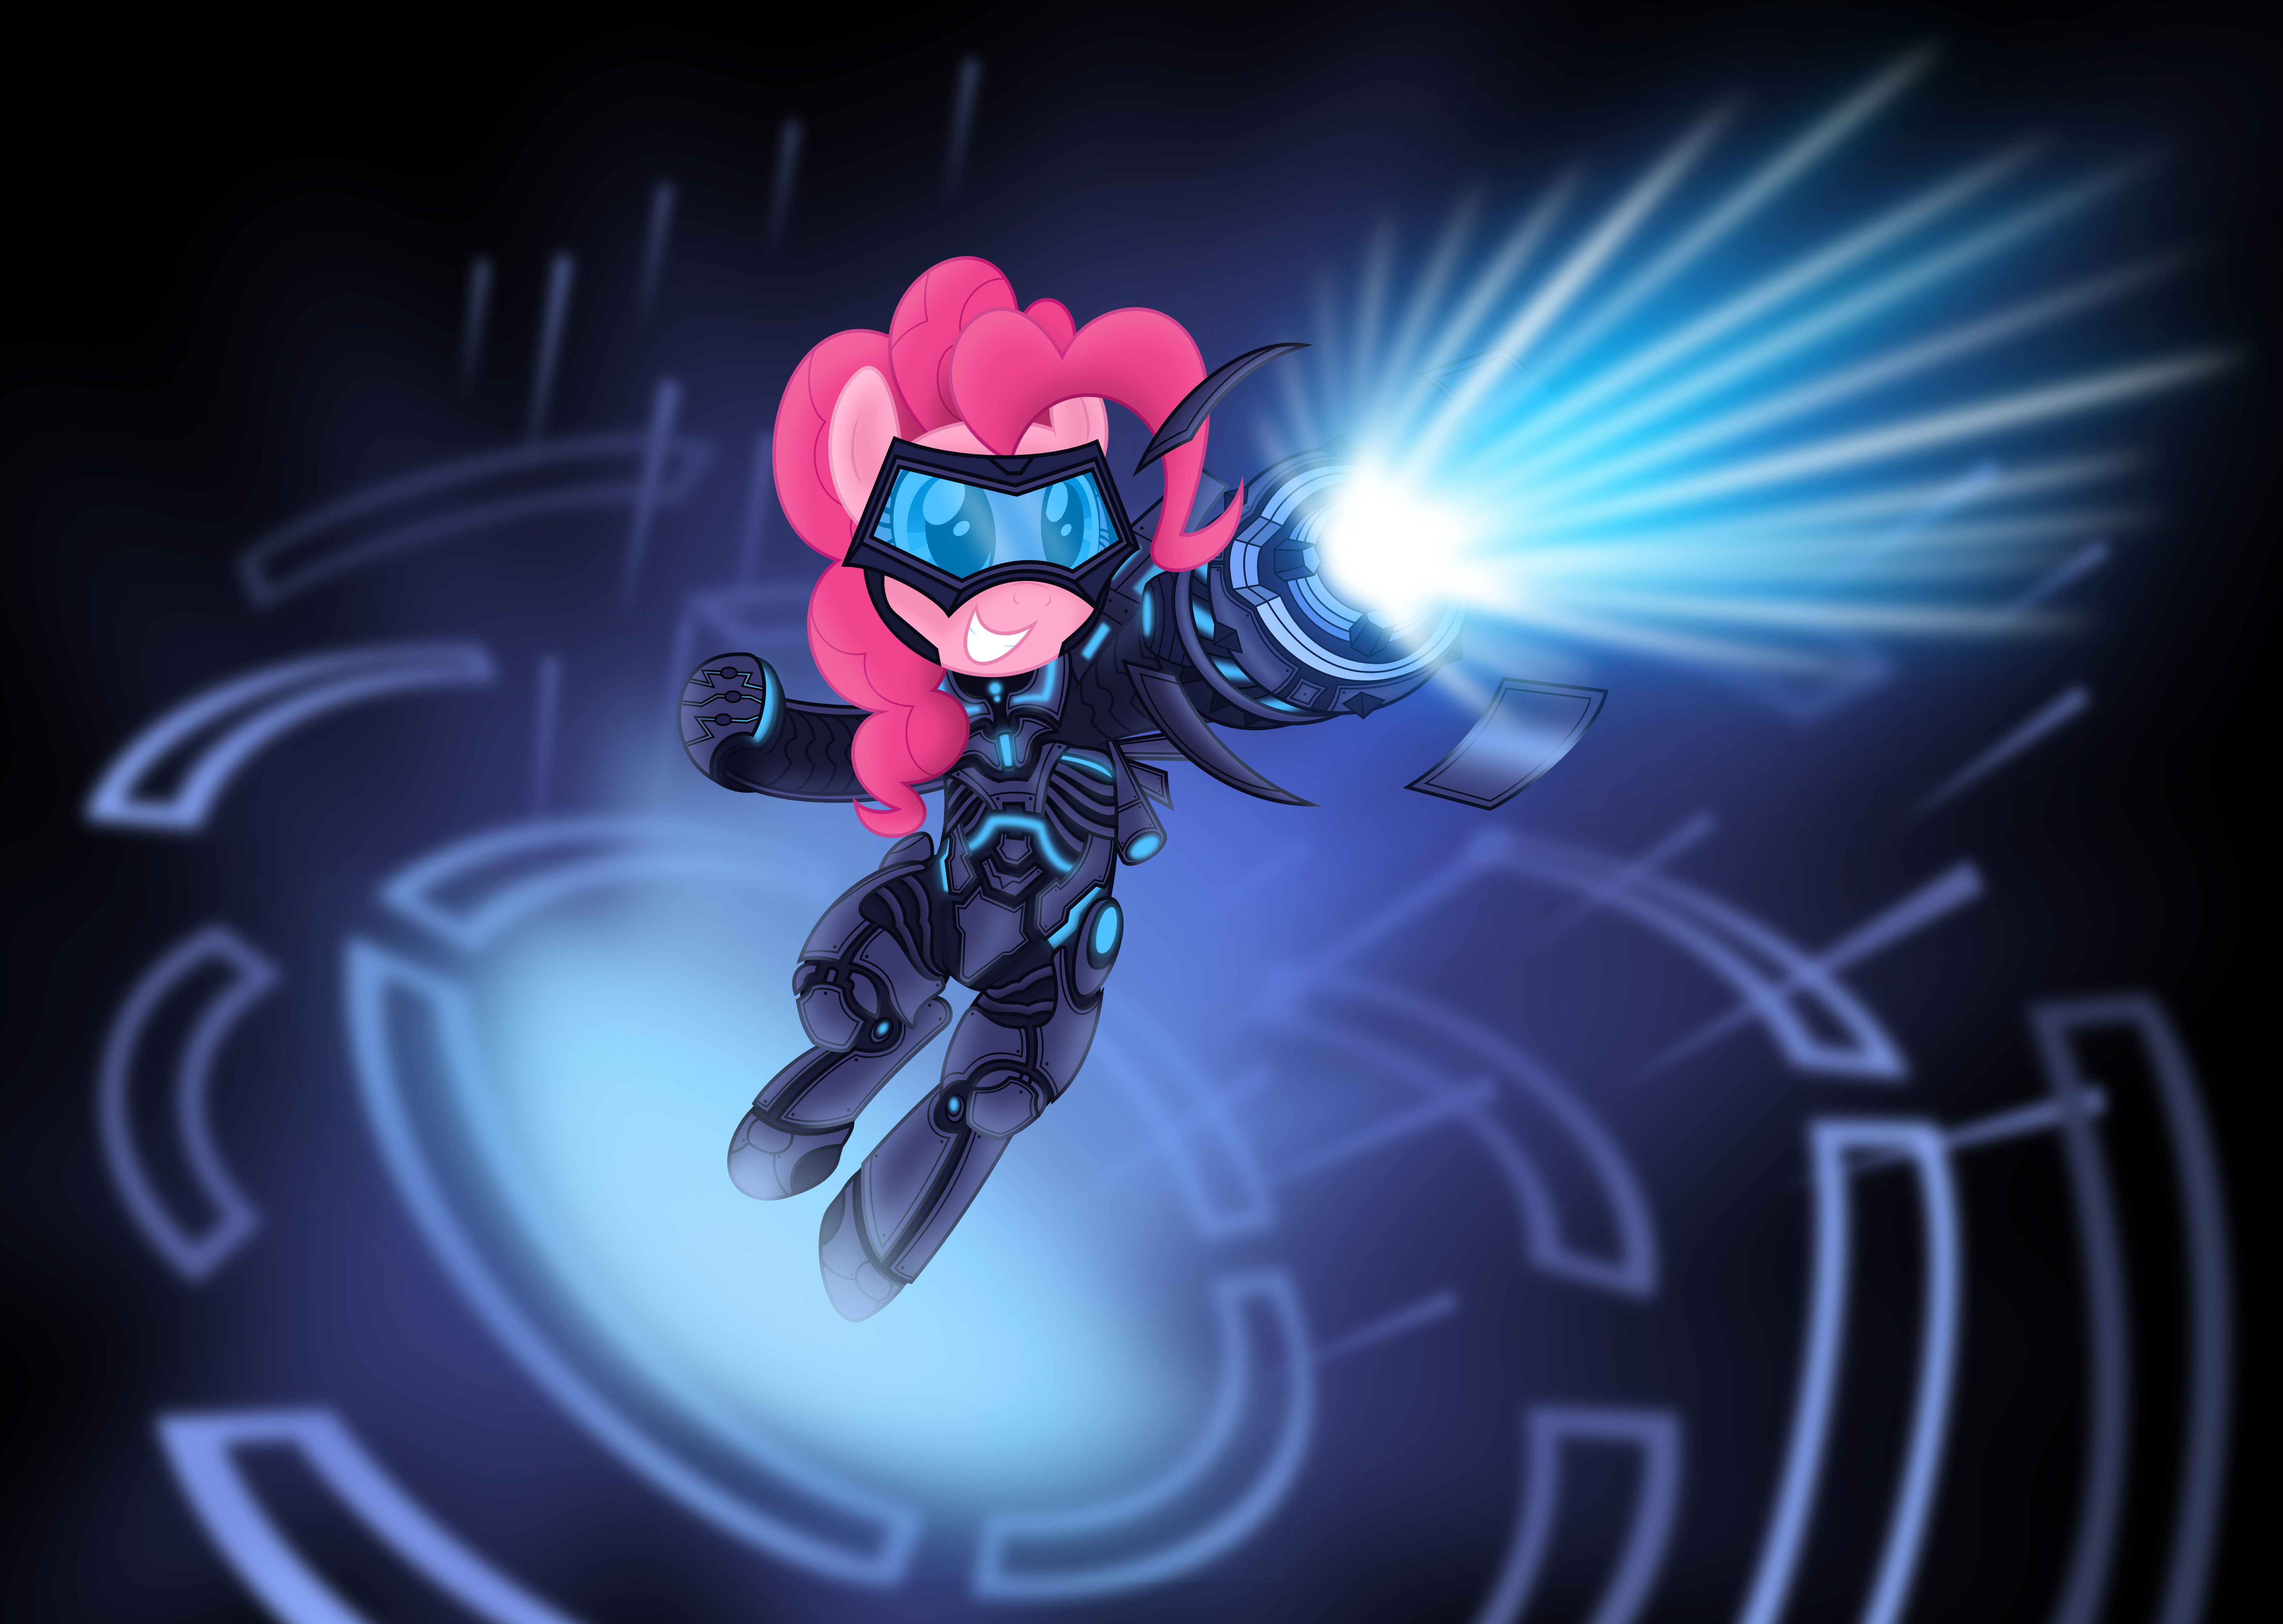 Pulsefire Pinkie by Psyxofthoros